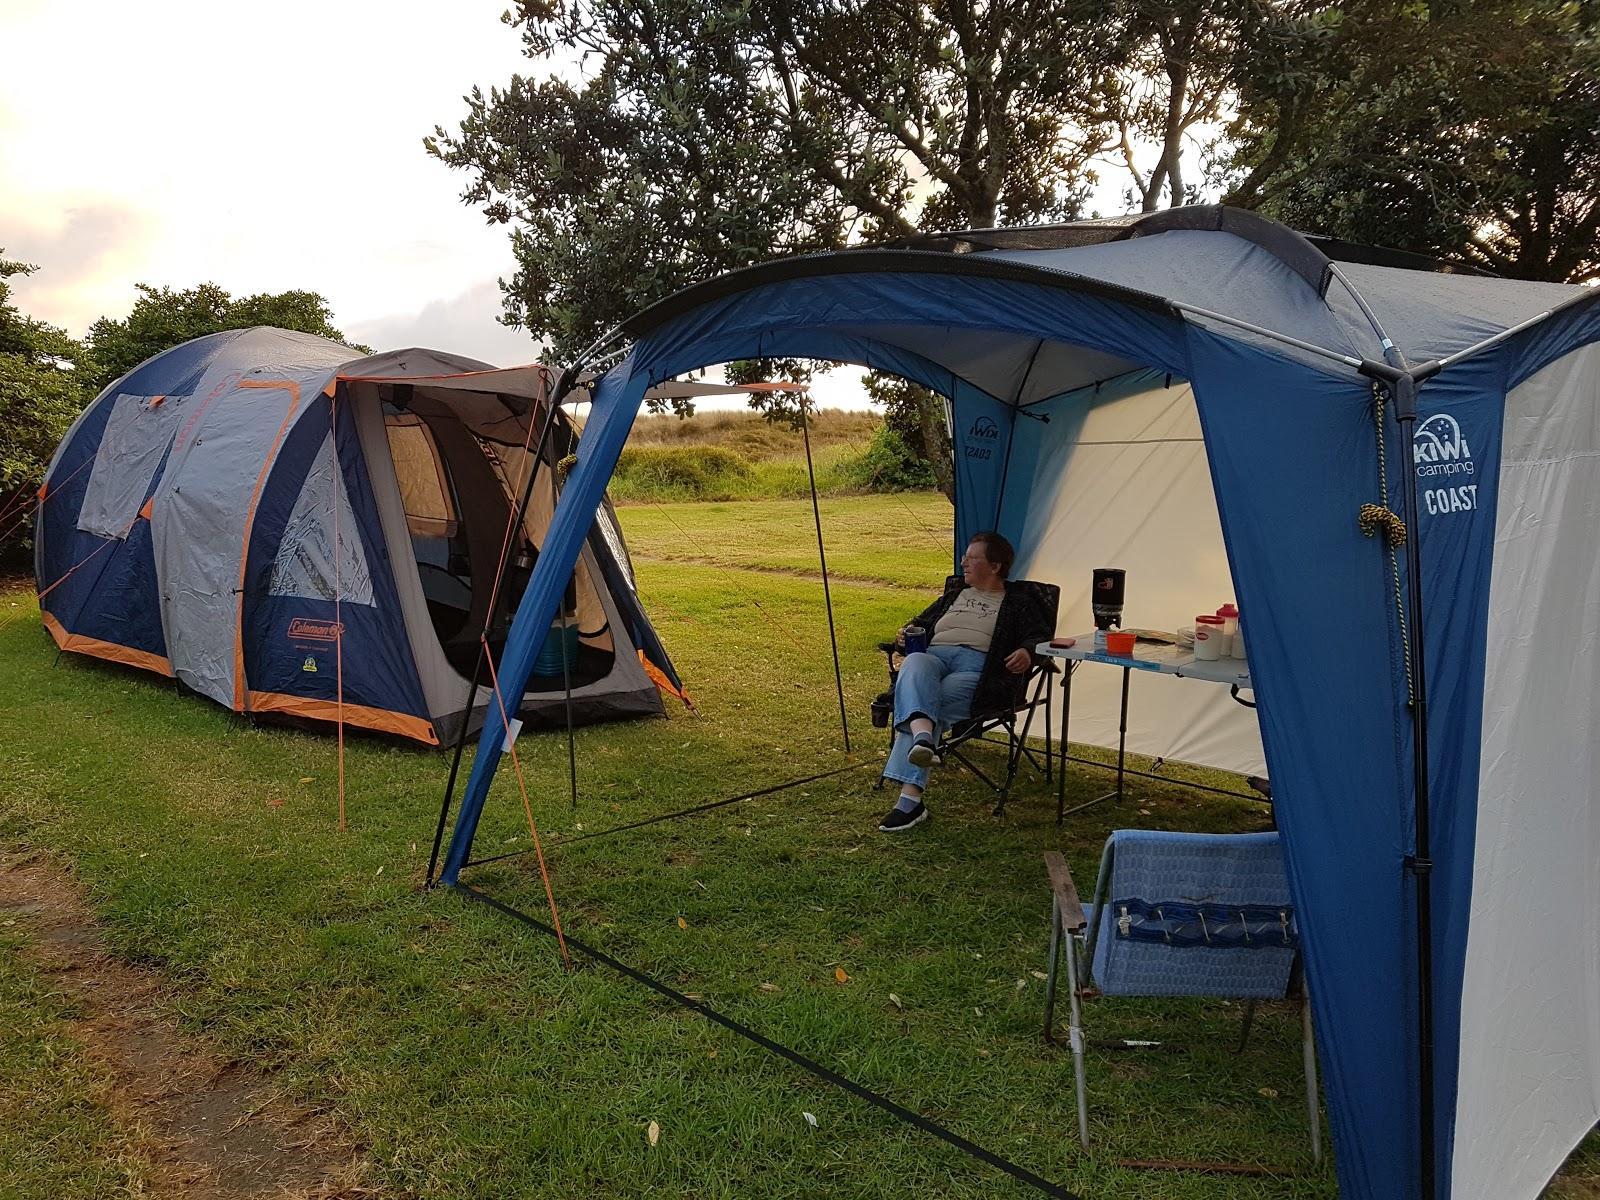 Pikowai Campground